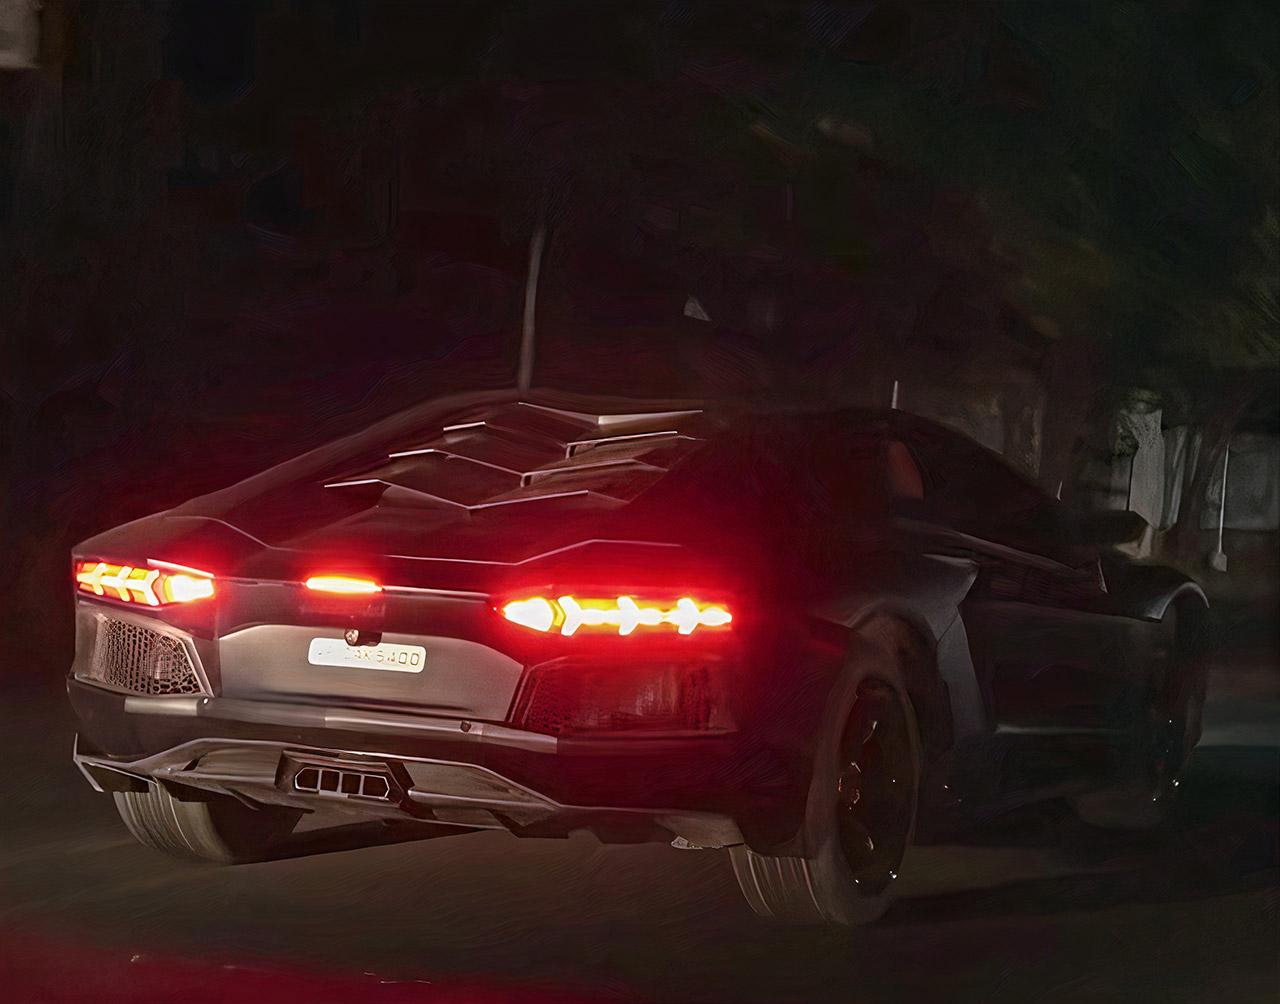 Honda Civic Lamborghini Aventador Replica